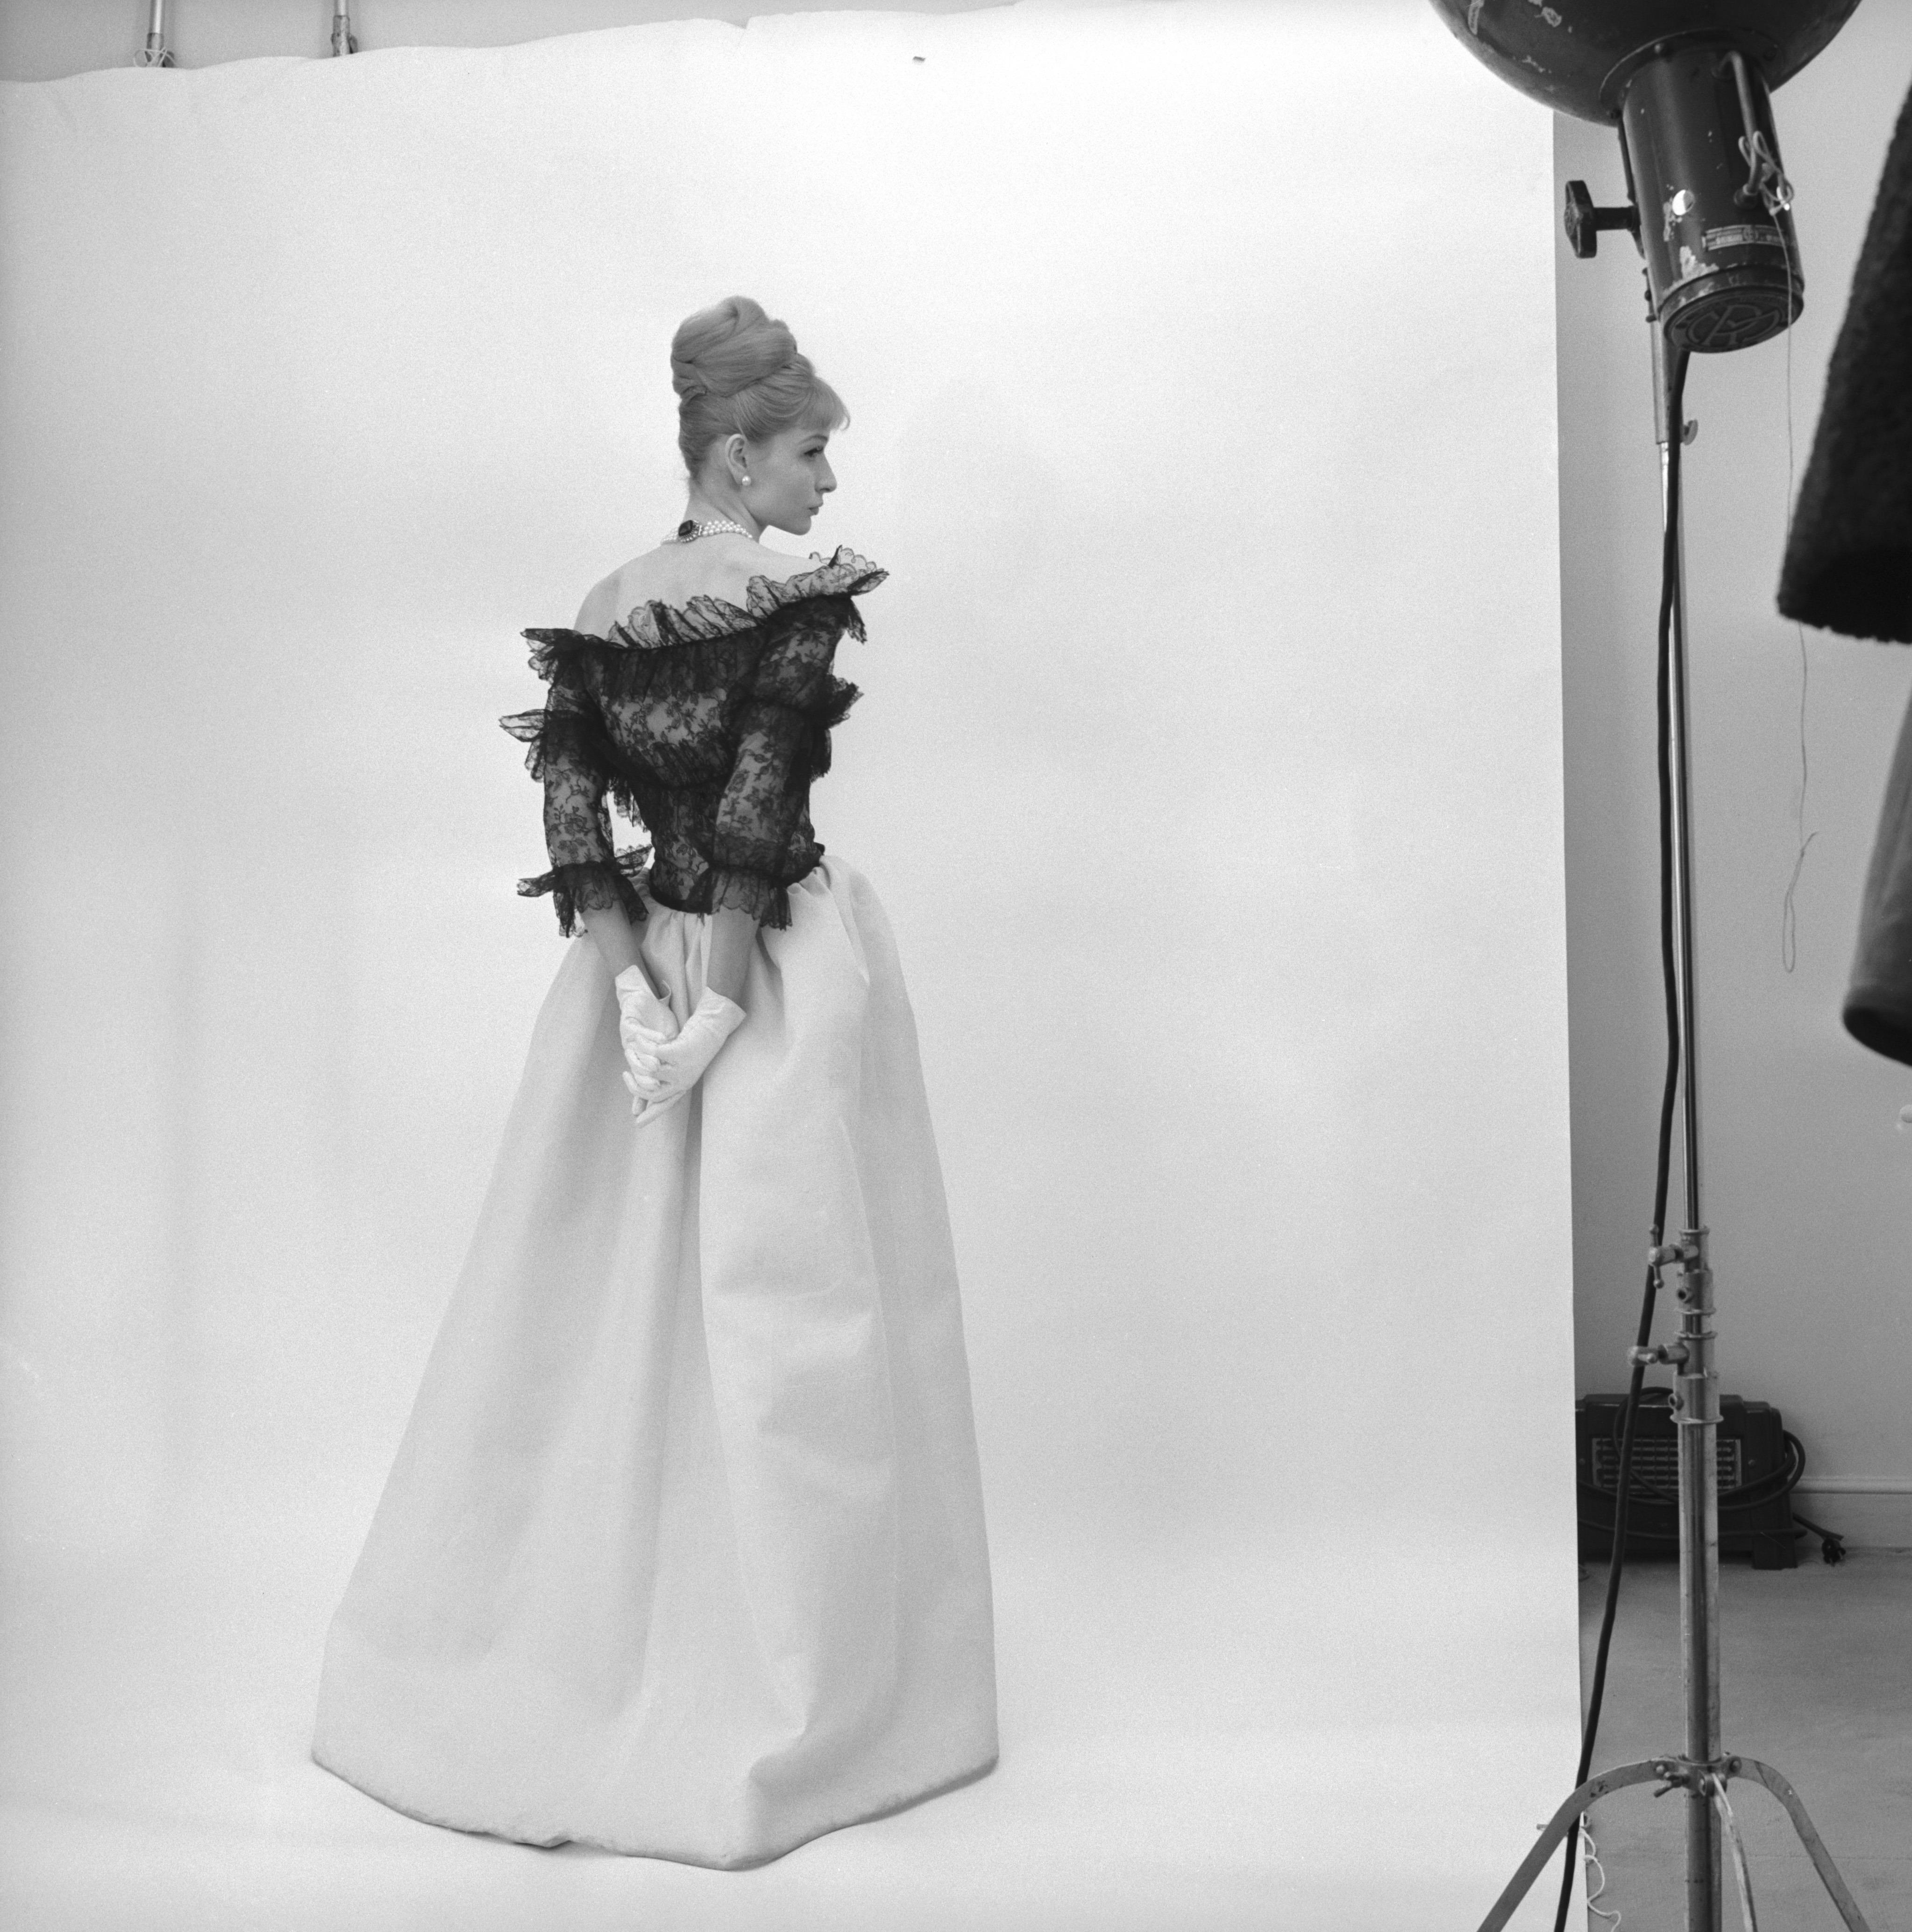 Balenciaga: Shaping Fashion, V&A Museum, London 4